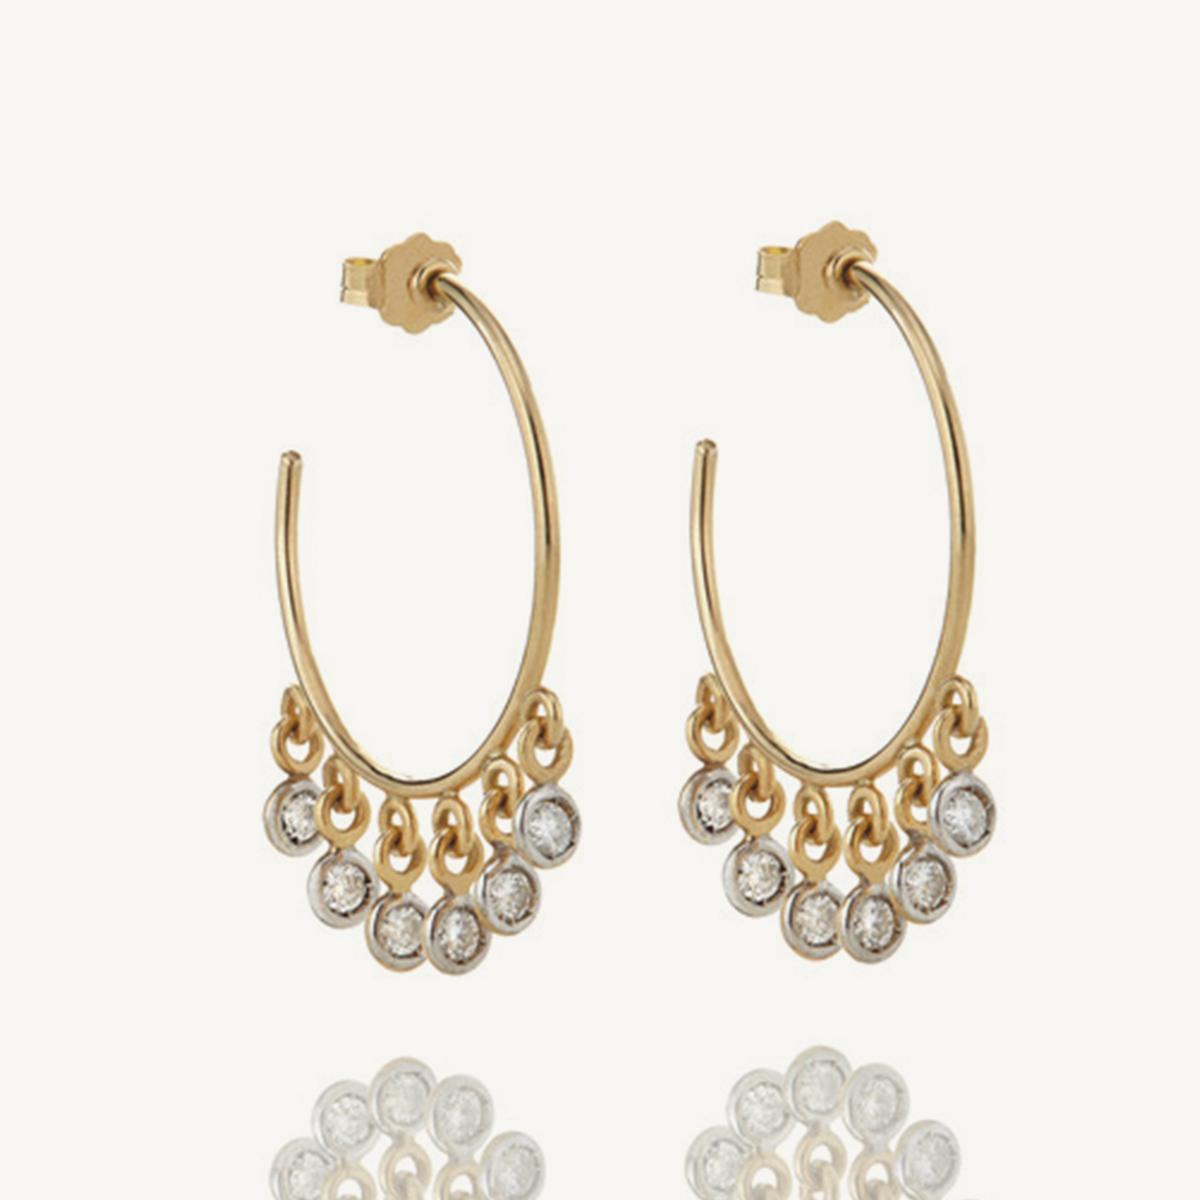 Earrings Hoola Hoops in yellow gold (SM)